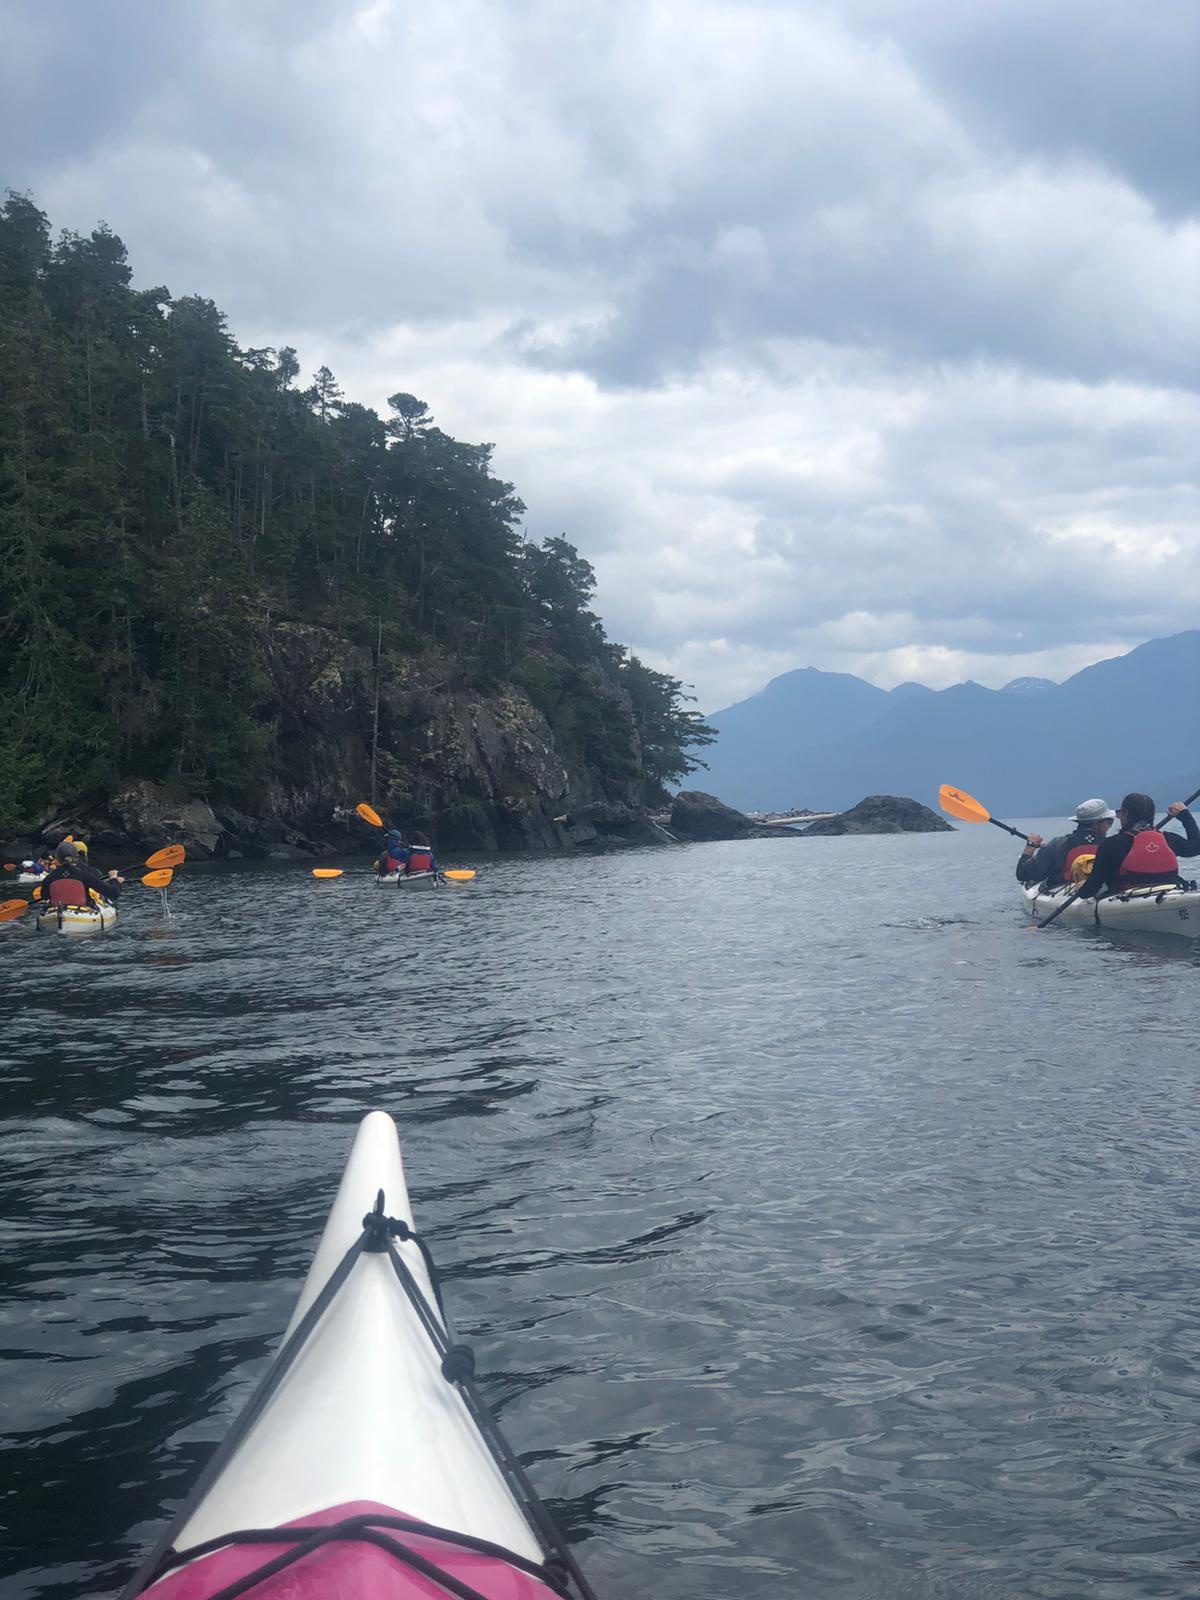 Johnstone Strait Half Day Guided Sea Kayaking Trip